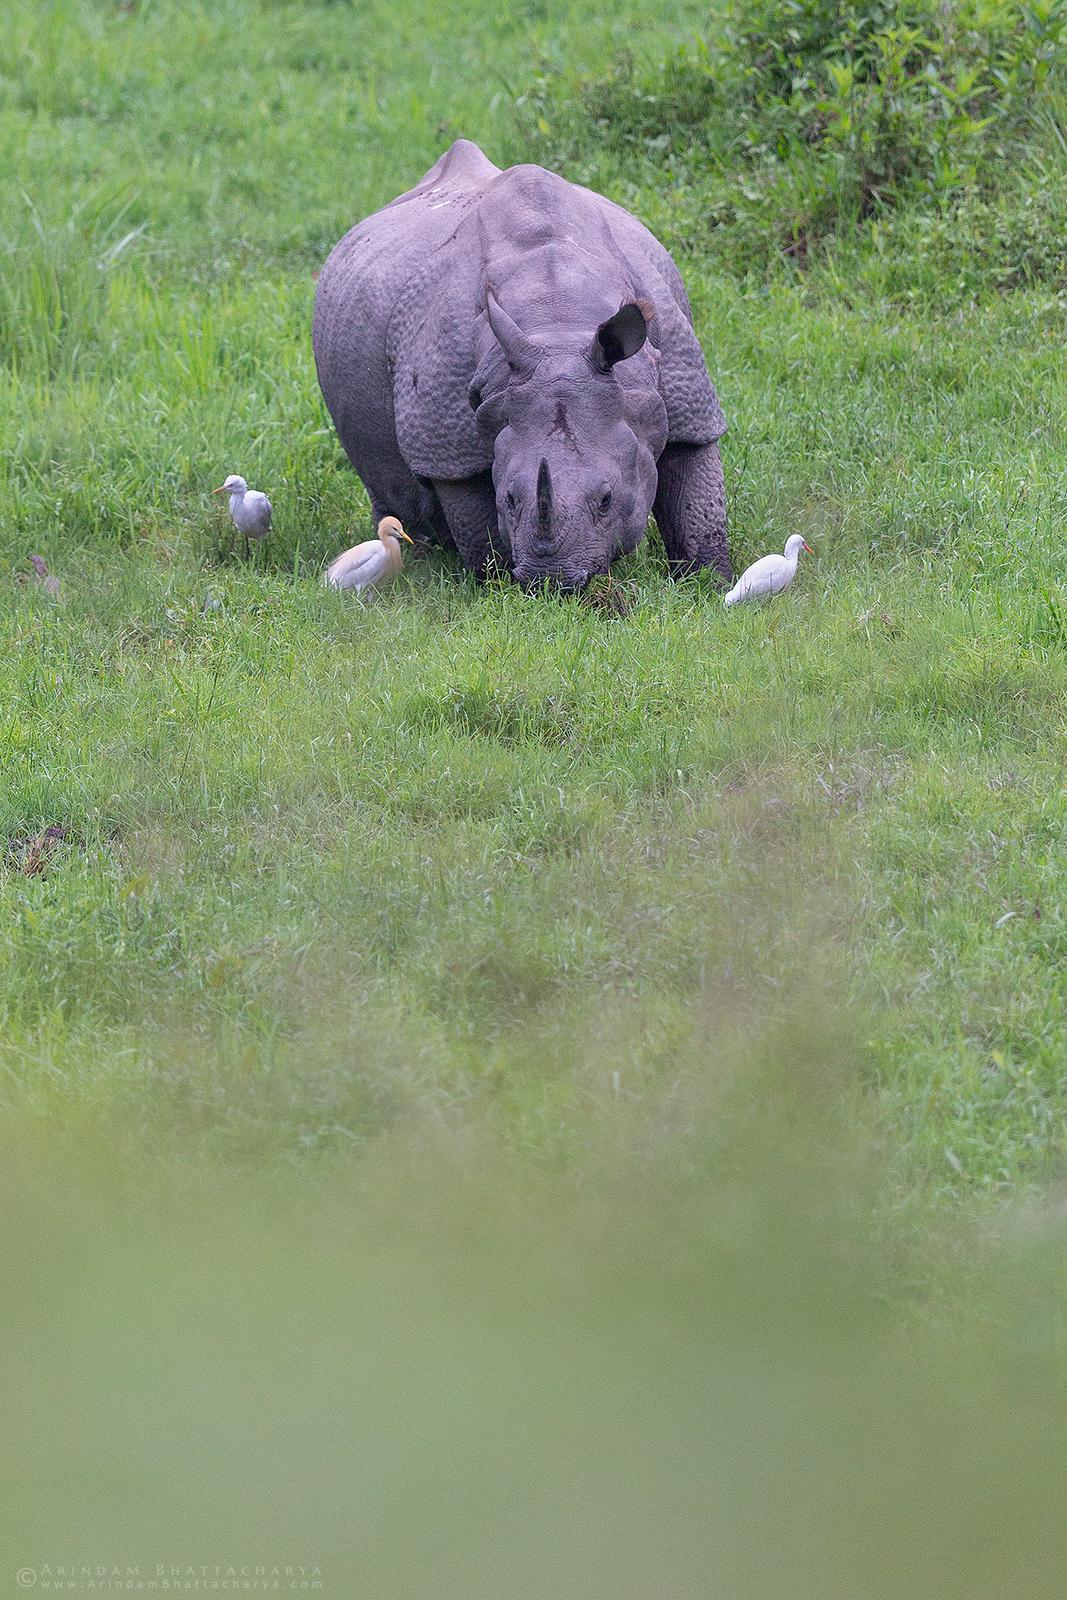 Indian one-horned rhinoceros in Gorumara National Park Dooars West Bengal India